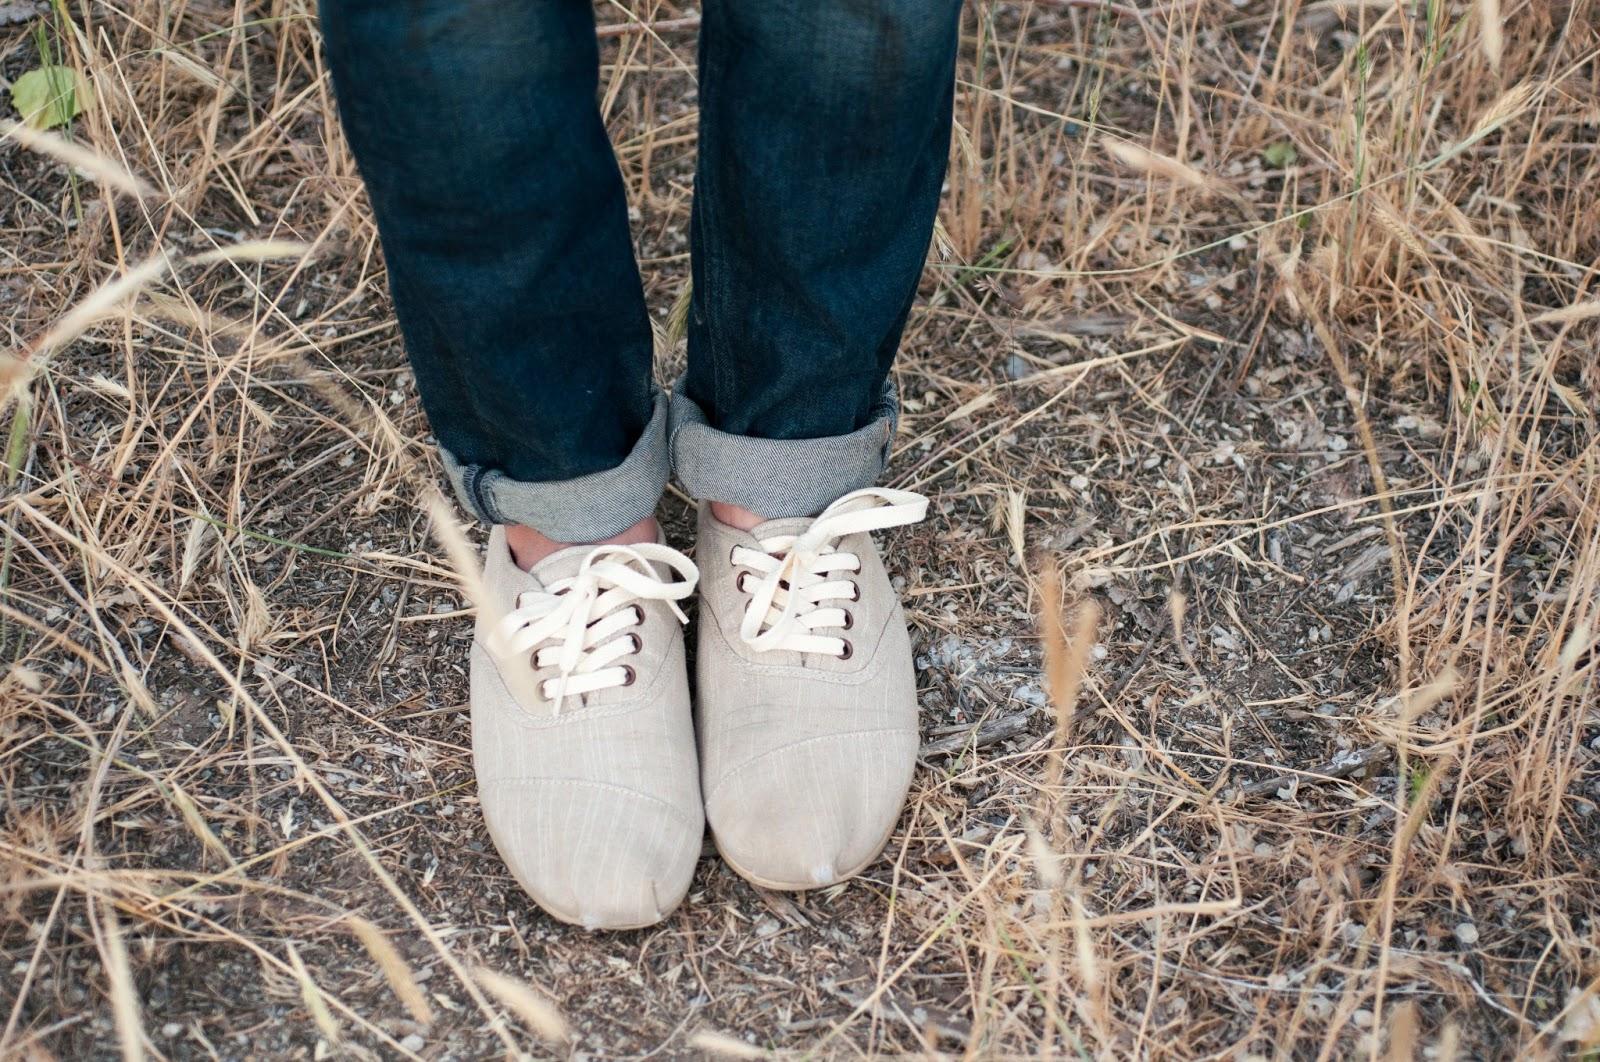 mens style blog, mens fashion, all saints, toms, mens ootd, ootd